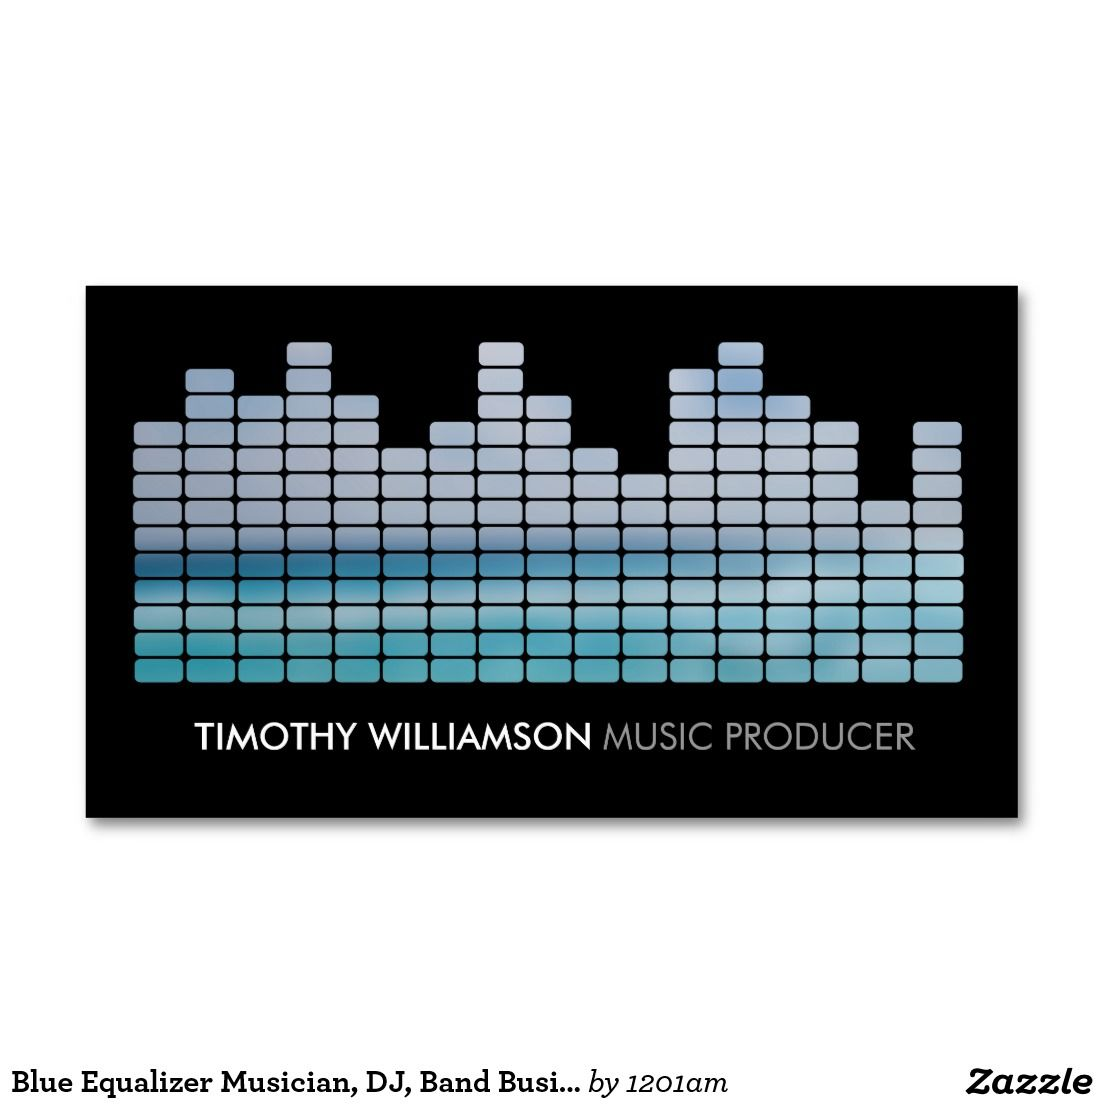 Blue Equalizer Musician, DJ, Band Business Card | DJ/Music ...